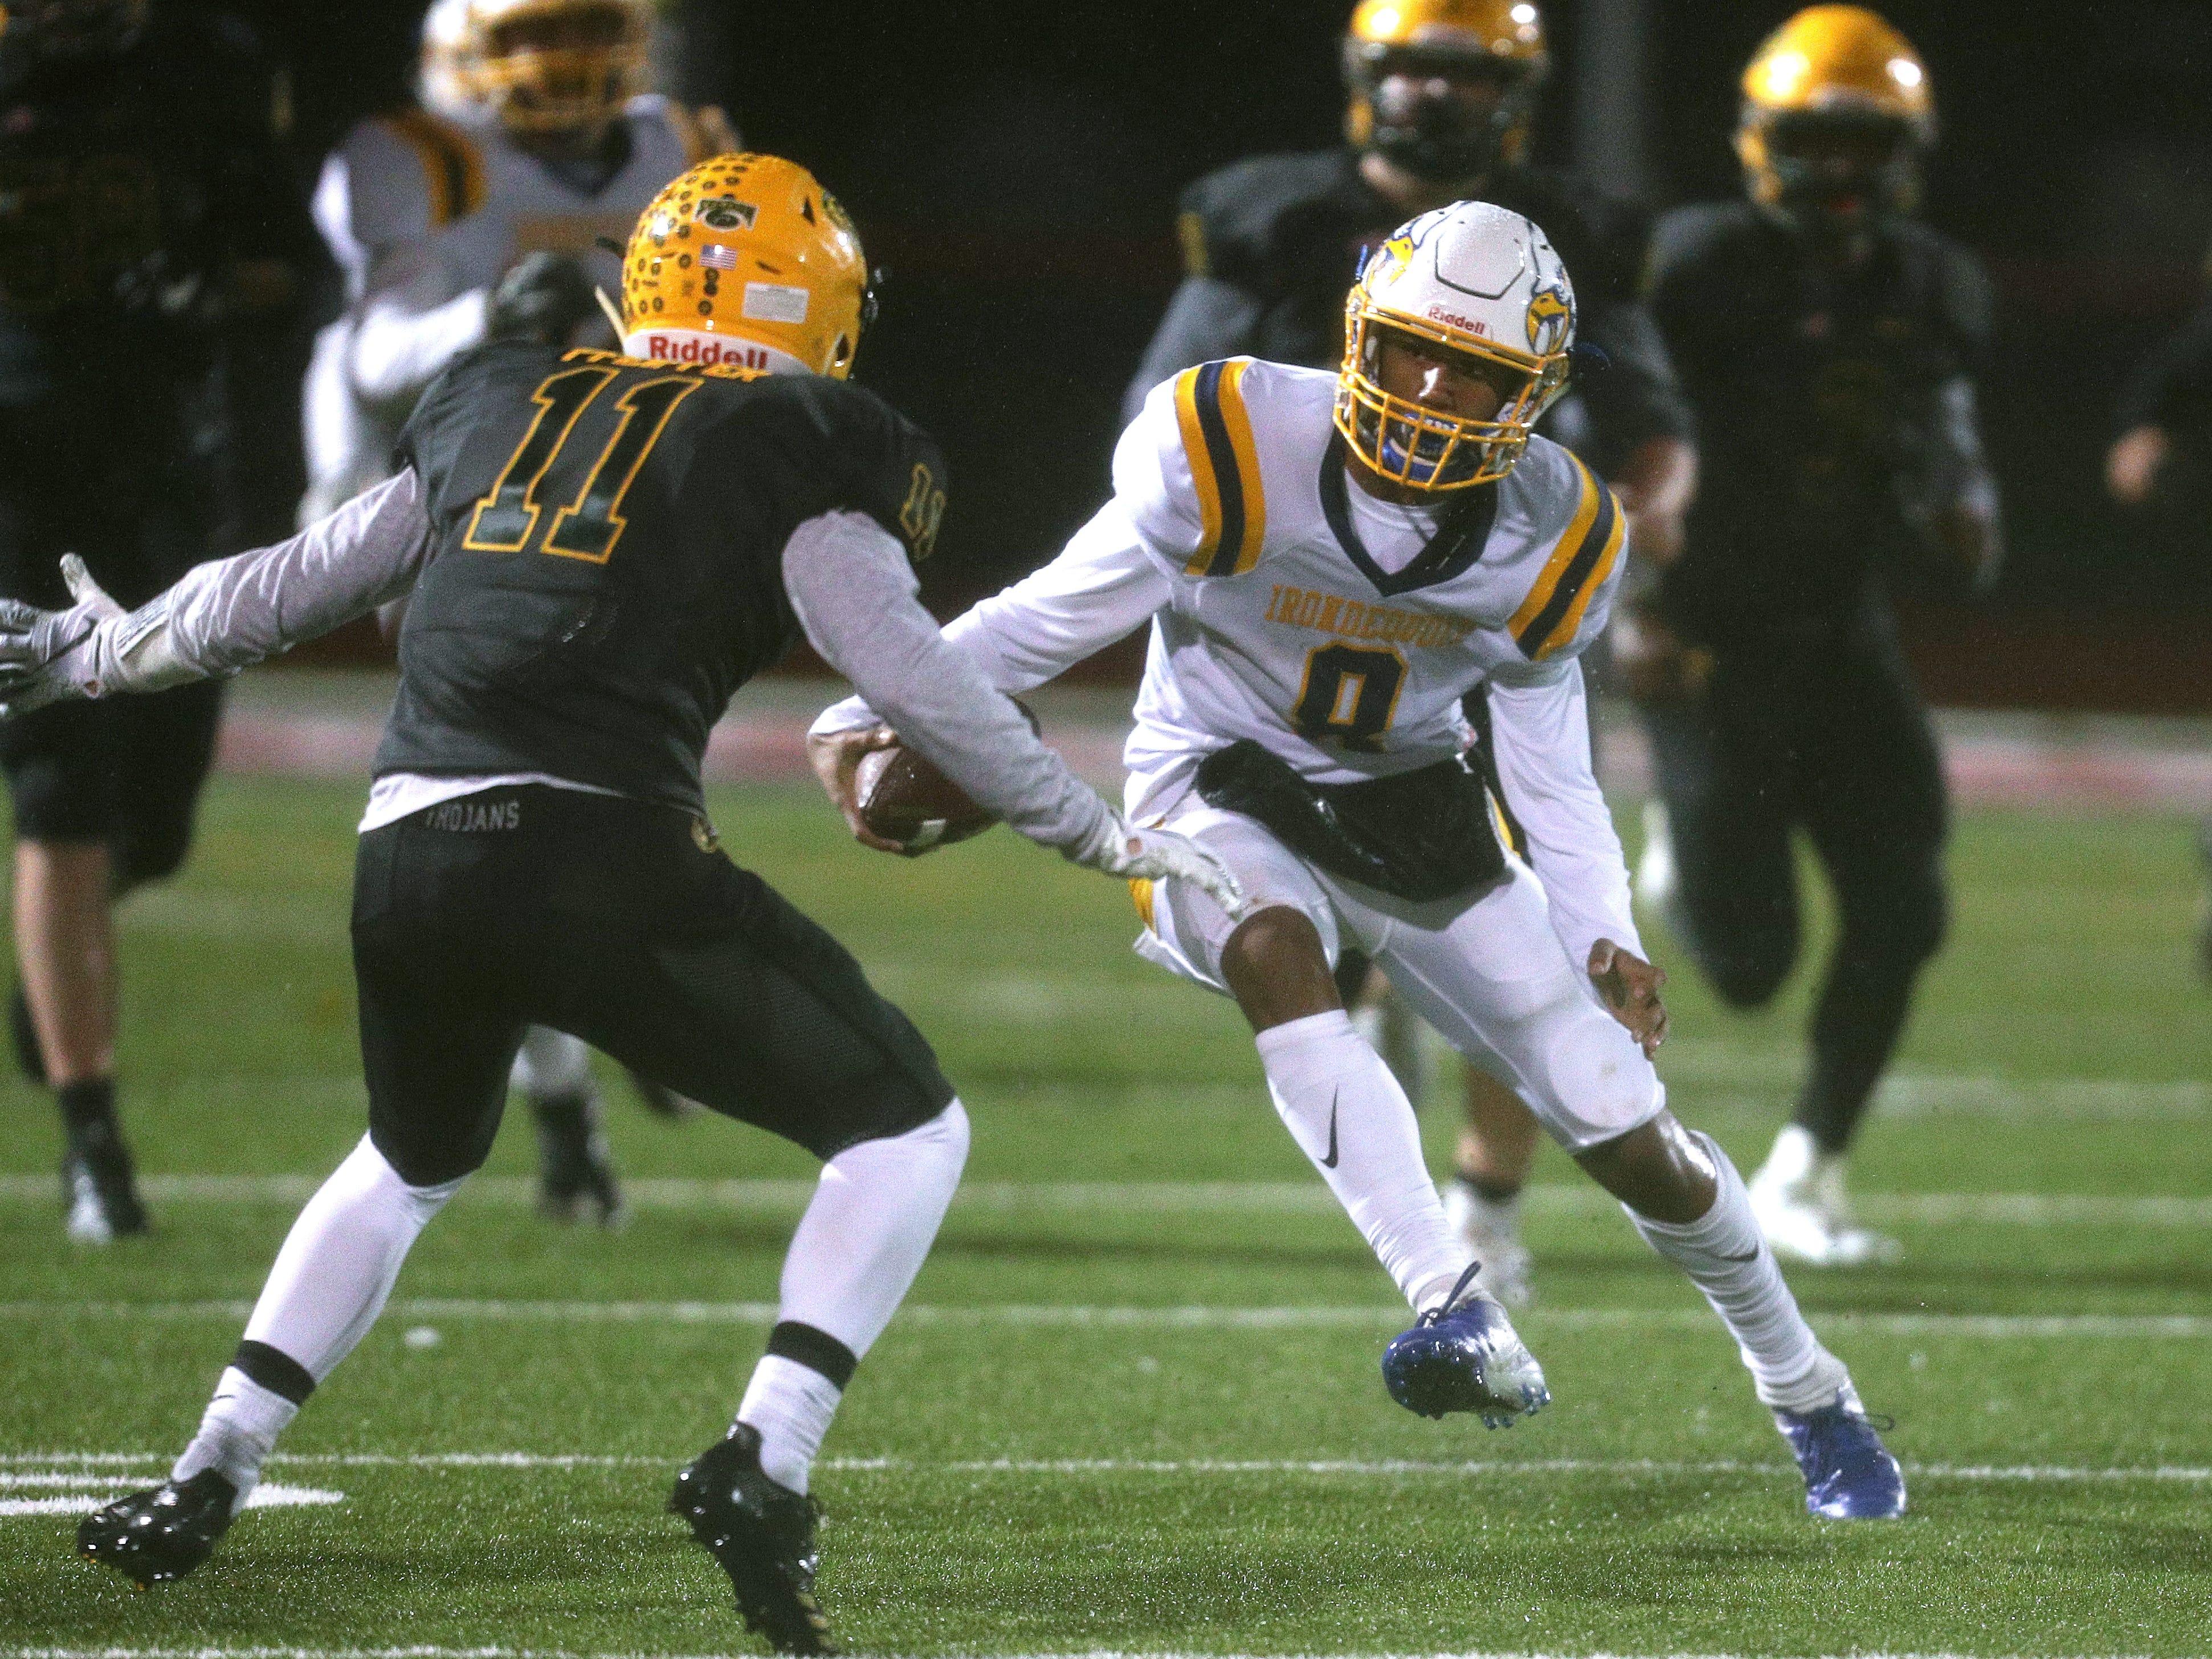 Irondequoit quarterback Freddy June Jr. slips past West Seneca East's Jesse Pfeiffer.